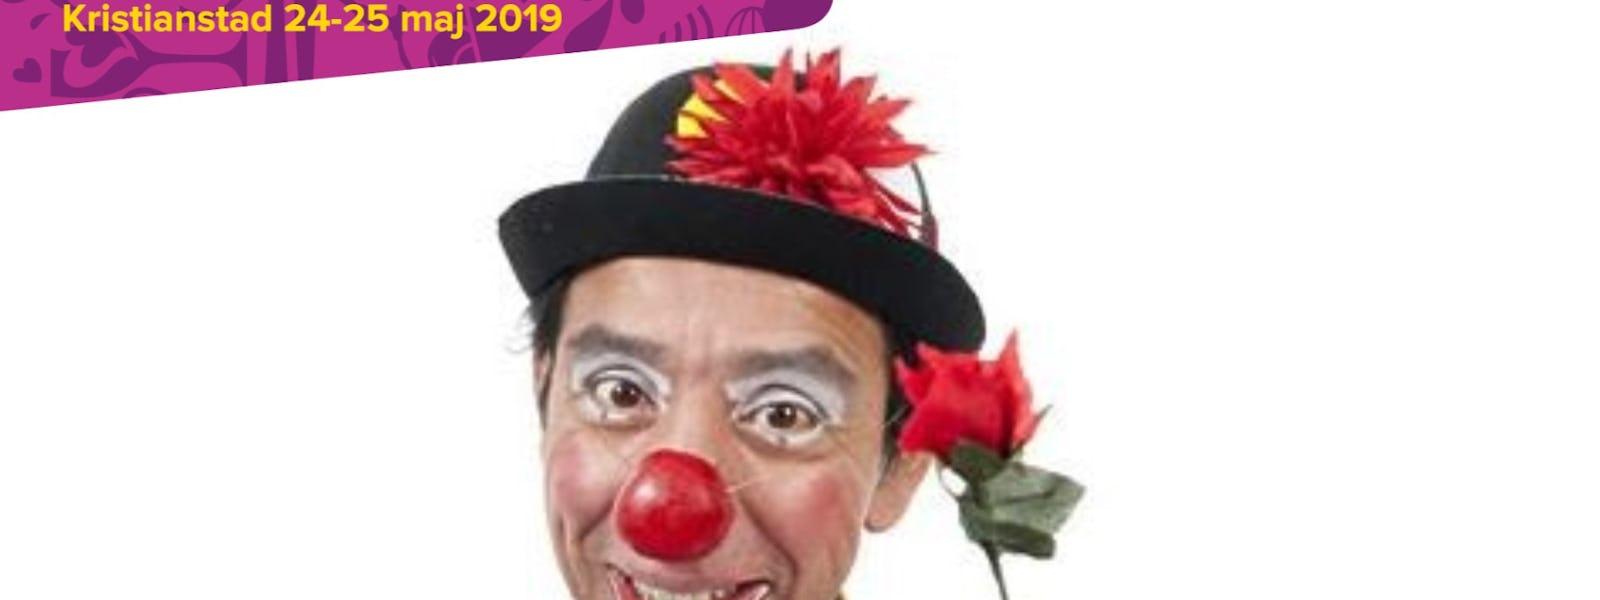 Bild - Träffa clownen Svante